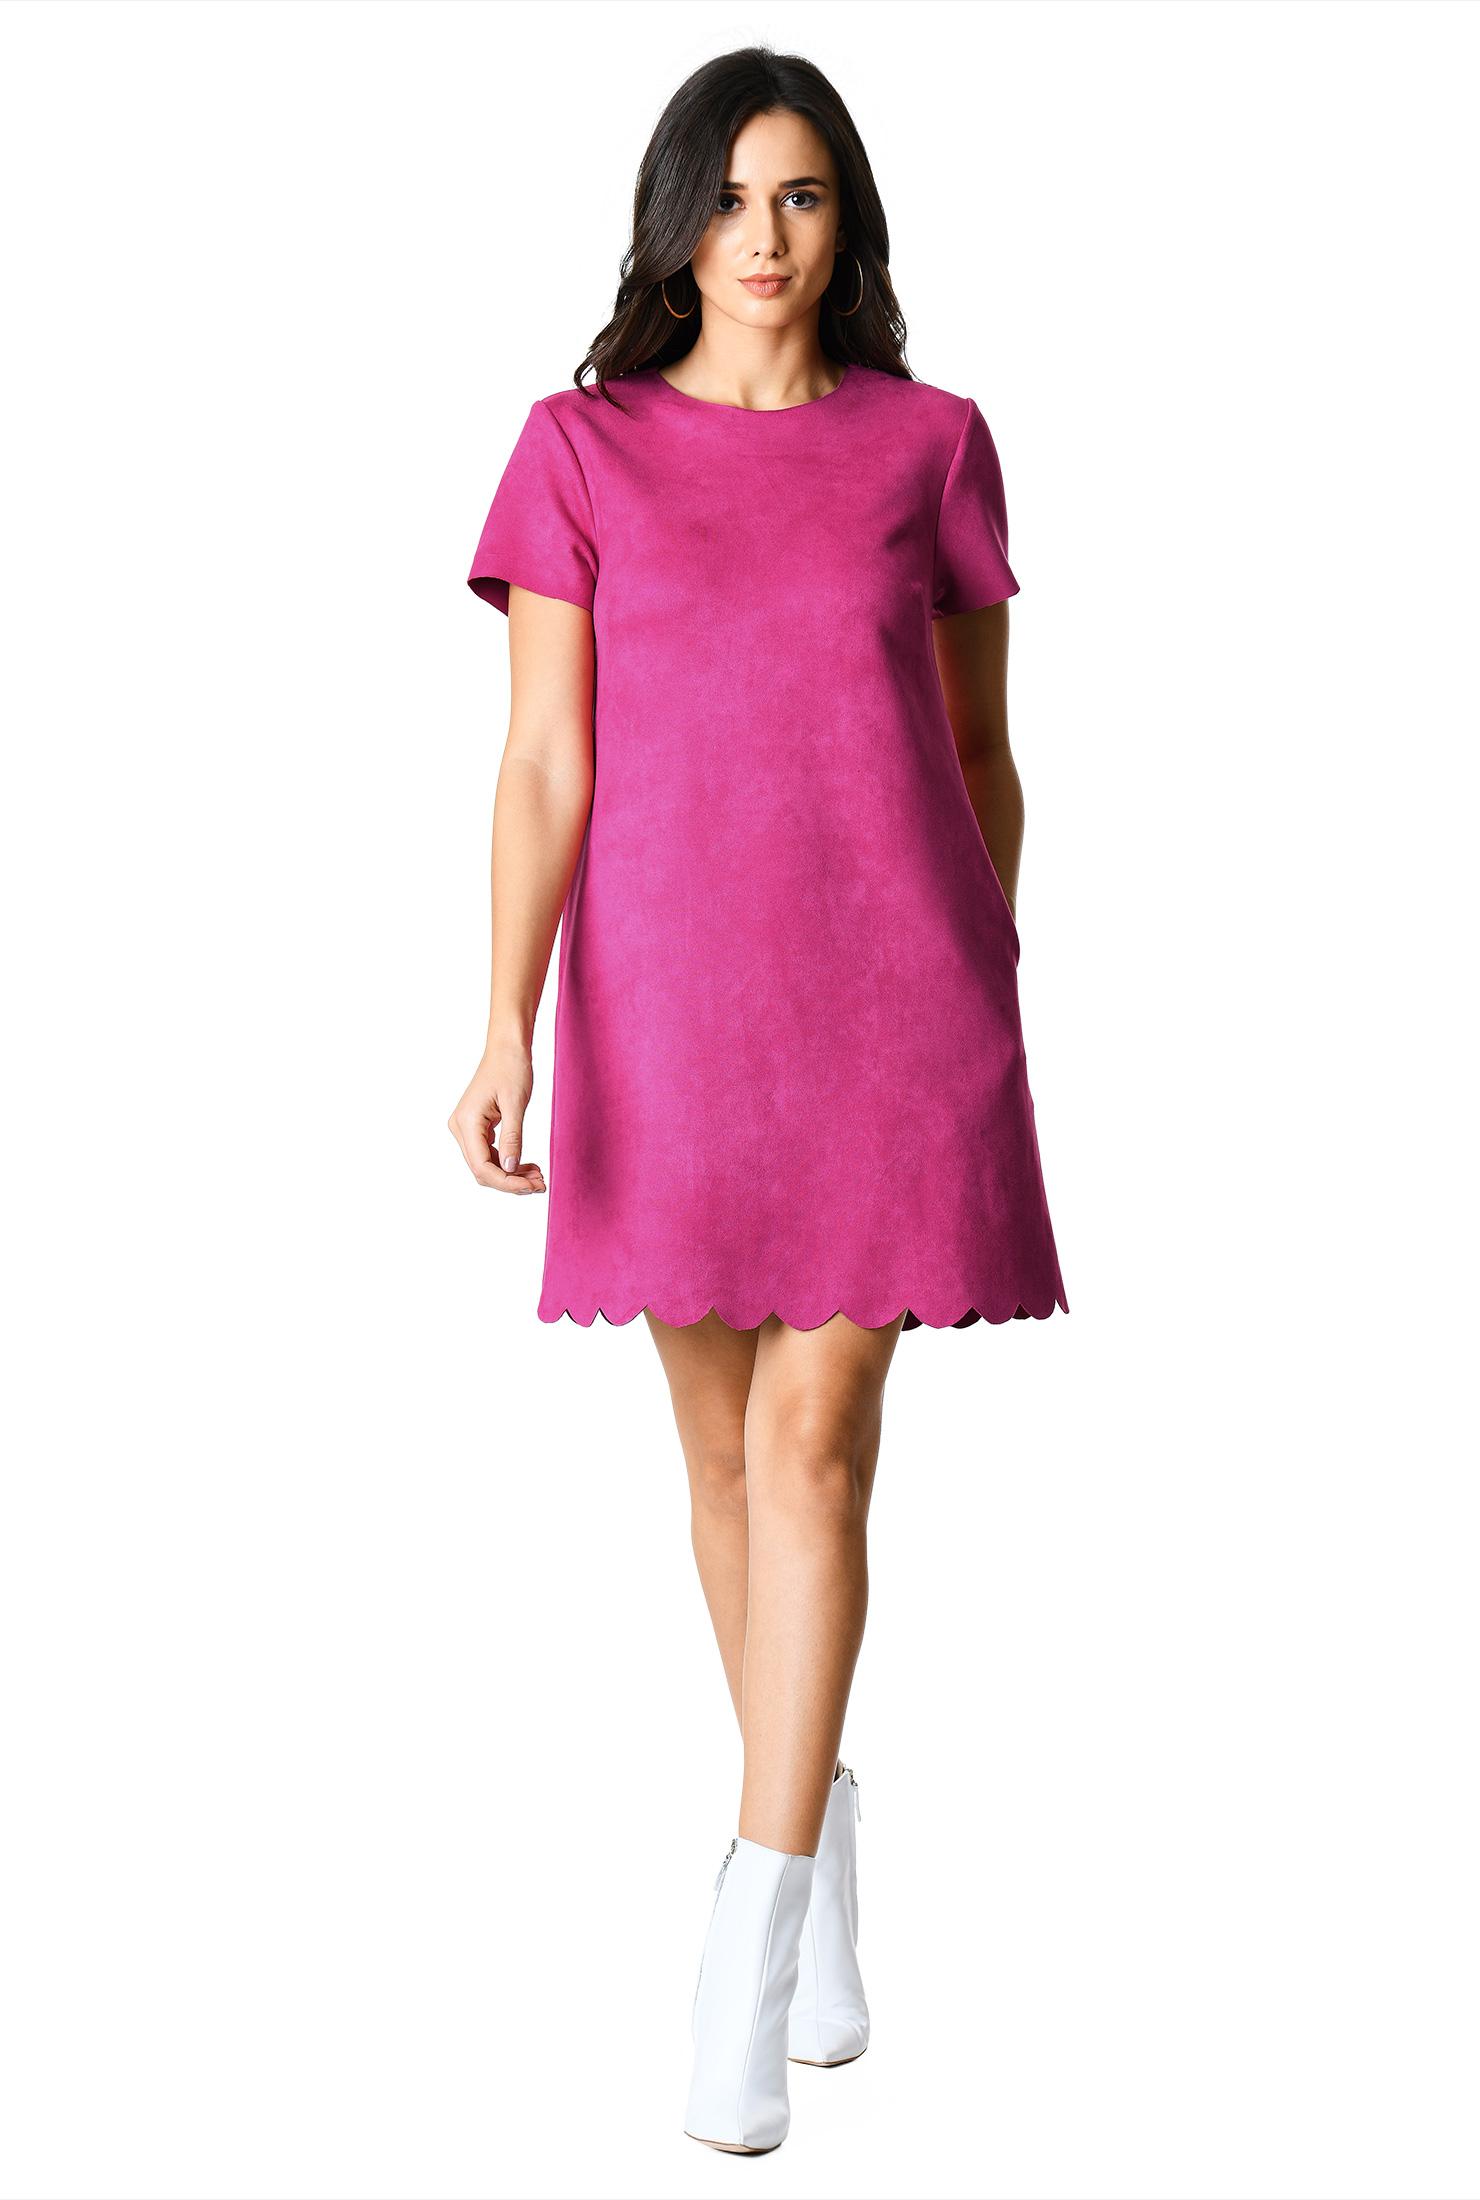 8a484be1e3d Women s Fashion Clothing 0-36W and Custom